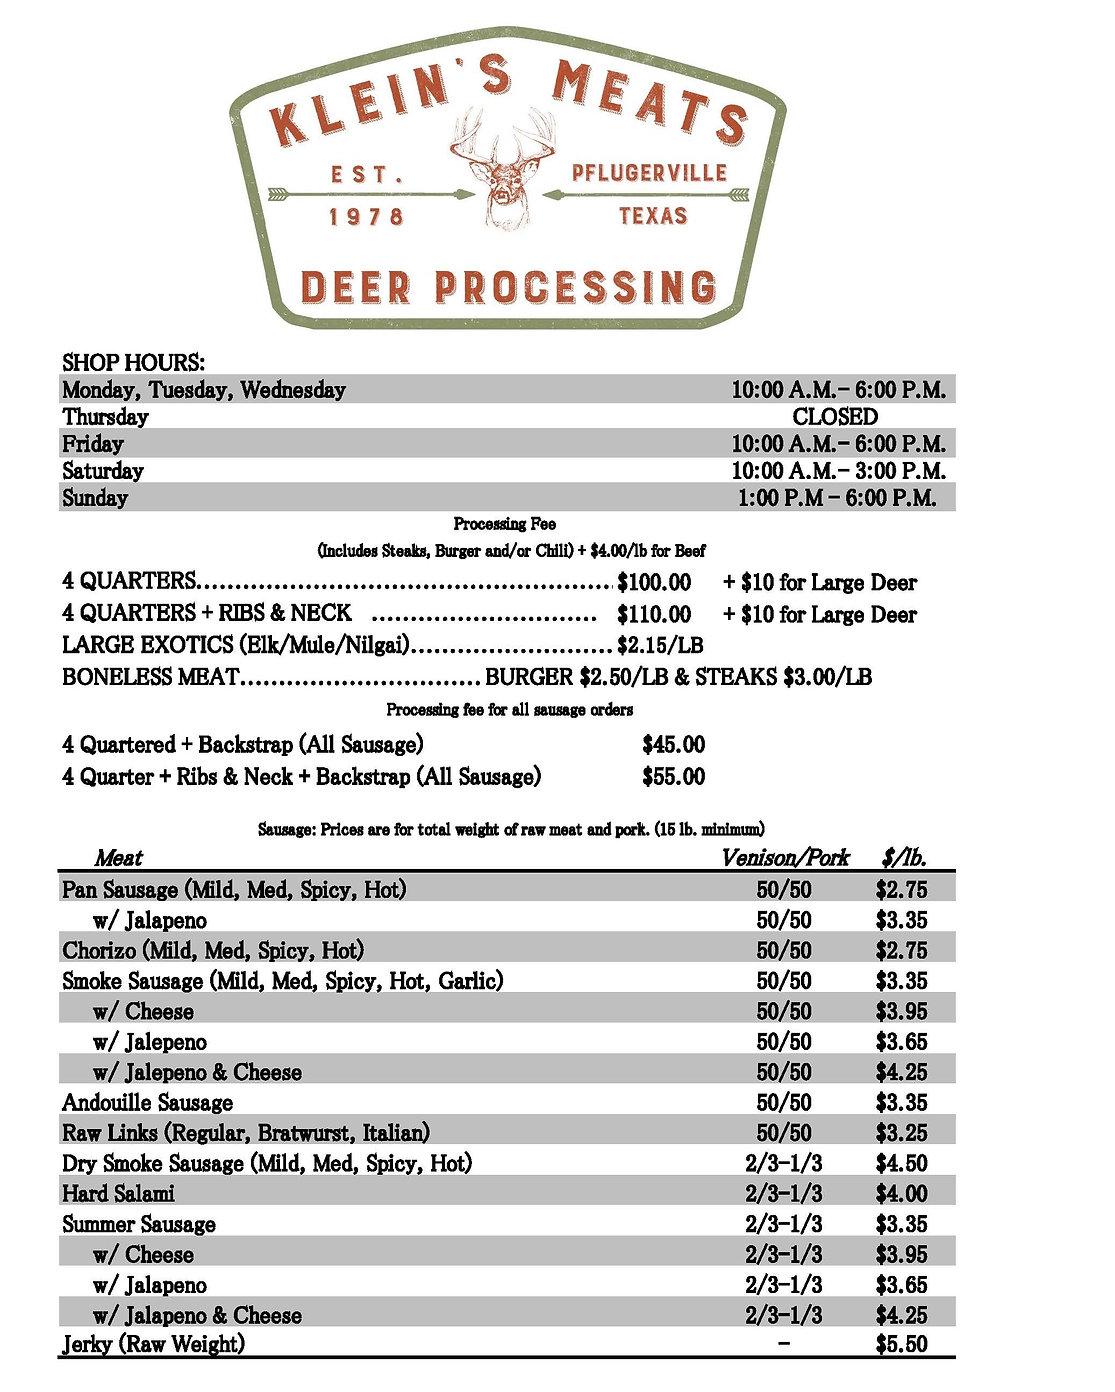 Klein's Price Sheet 2020.jpg